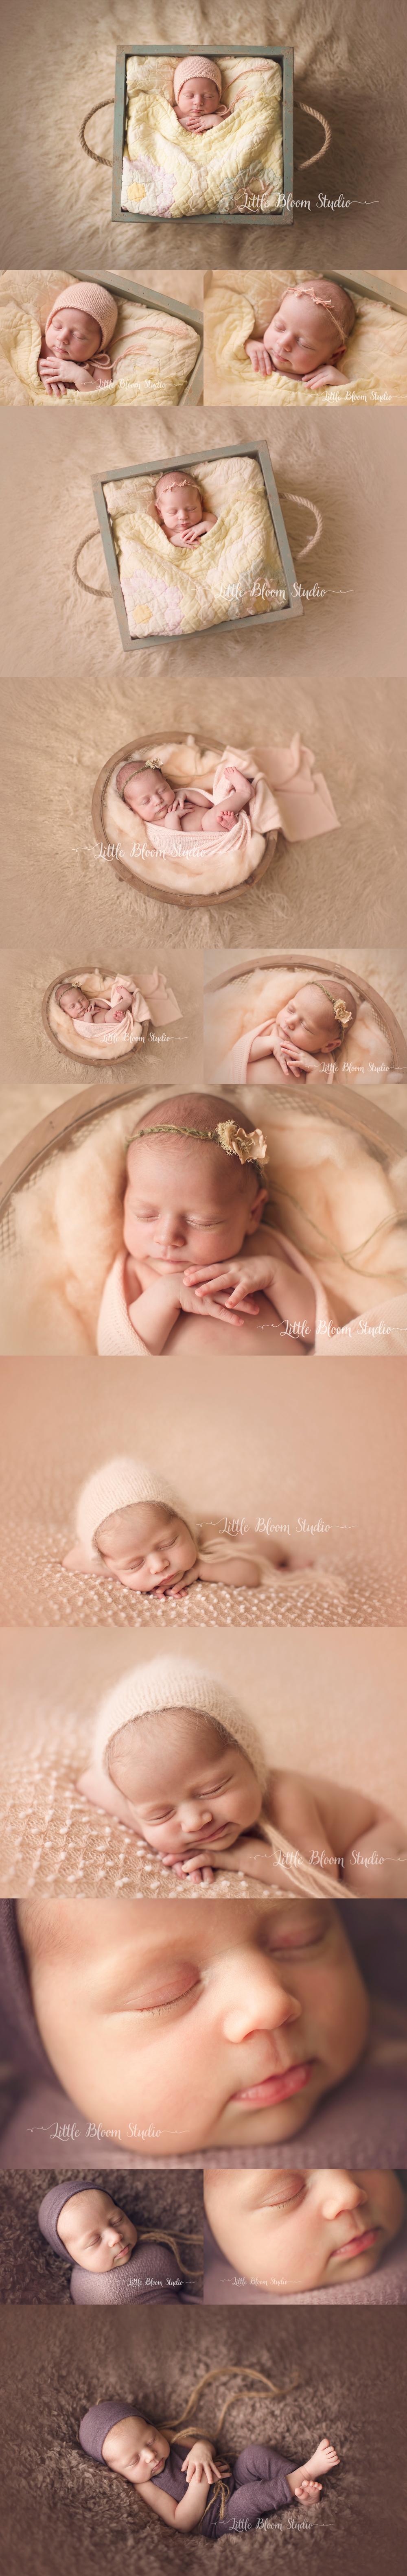 greenville_newborn_photography.jpg